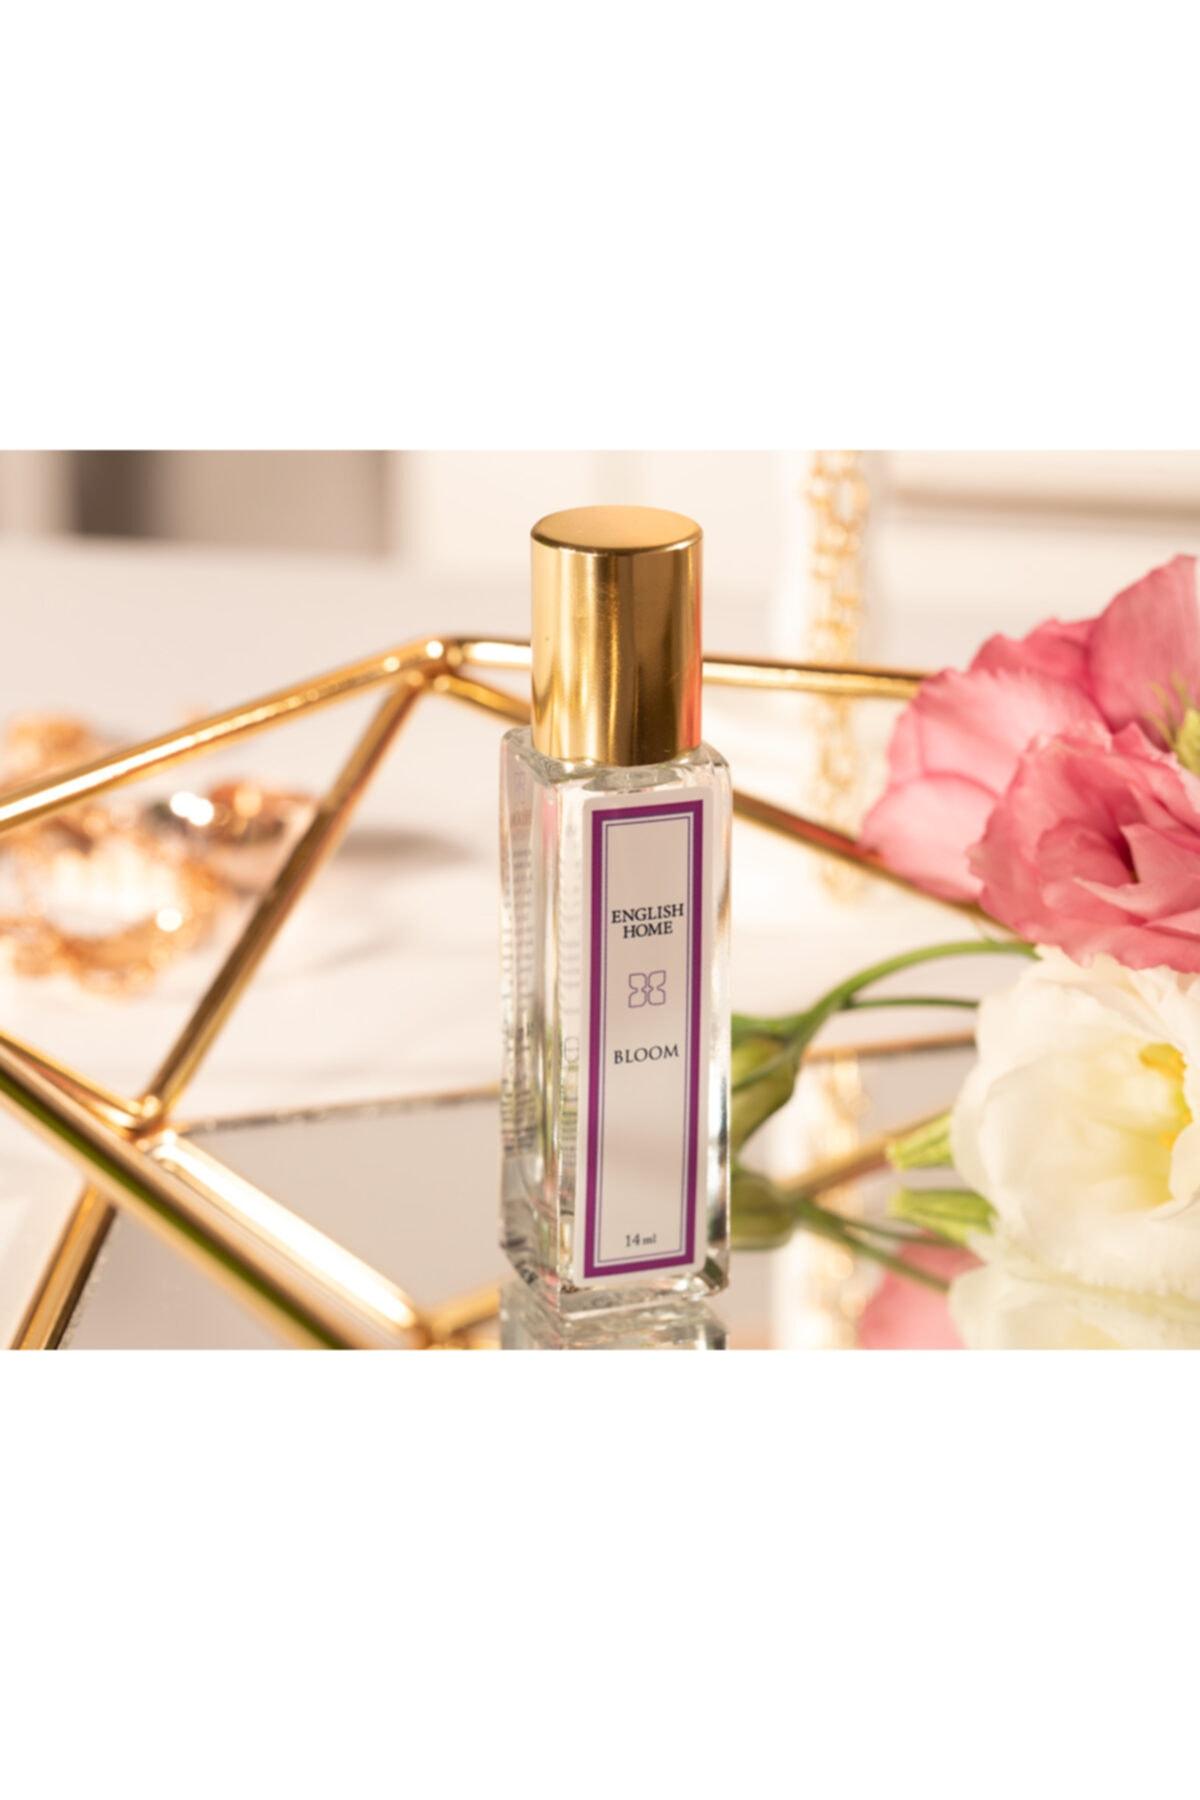 English Home Bloom 14 ml Şeffaf Unisex Parfüm 1